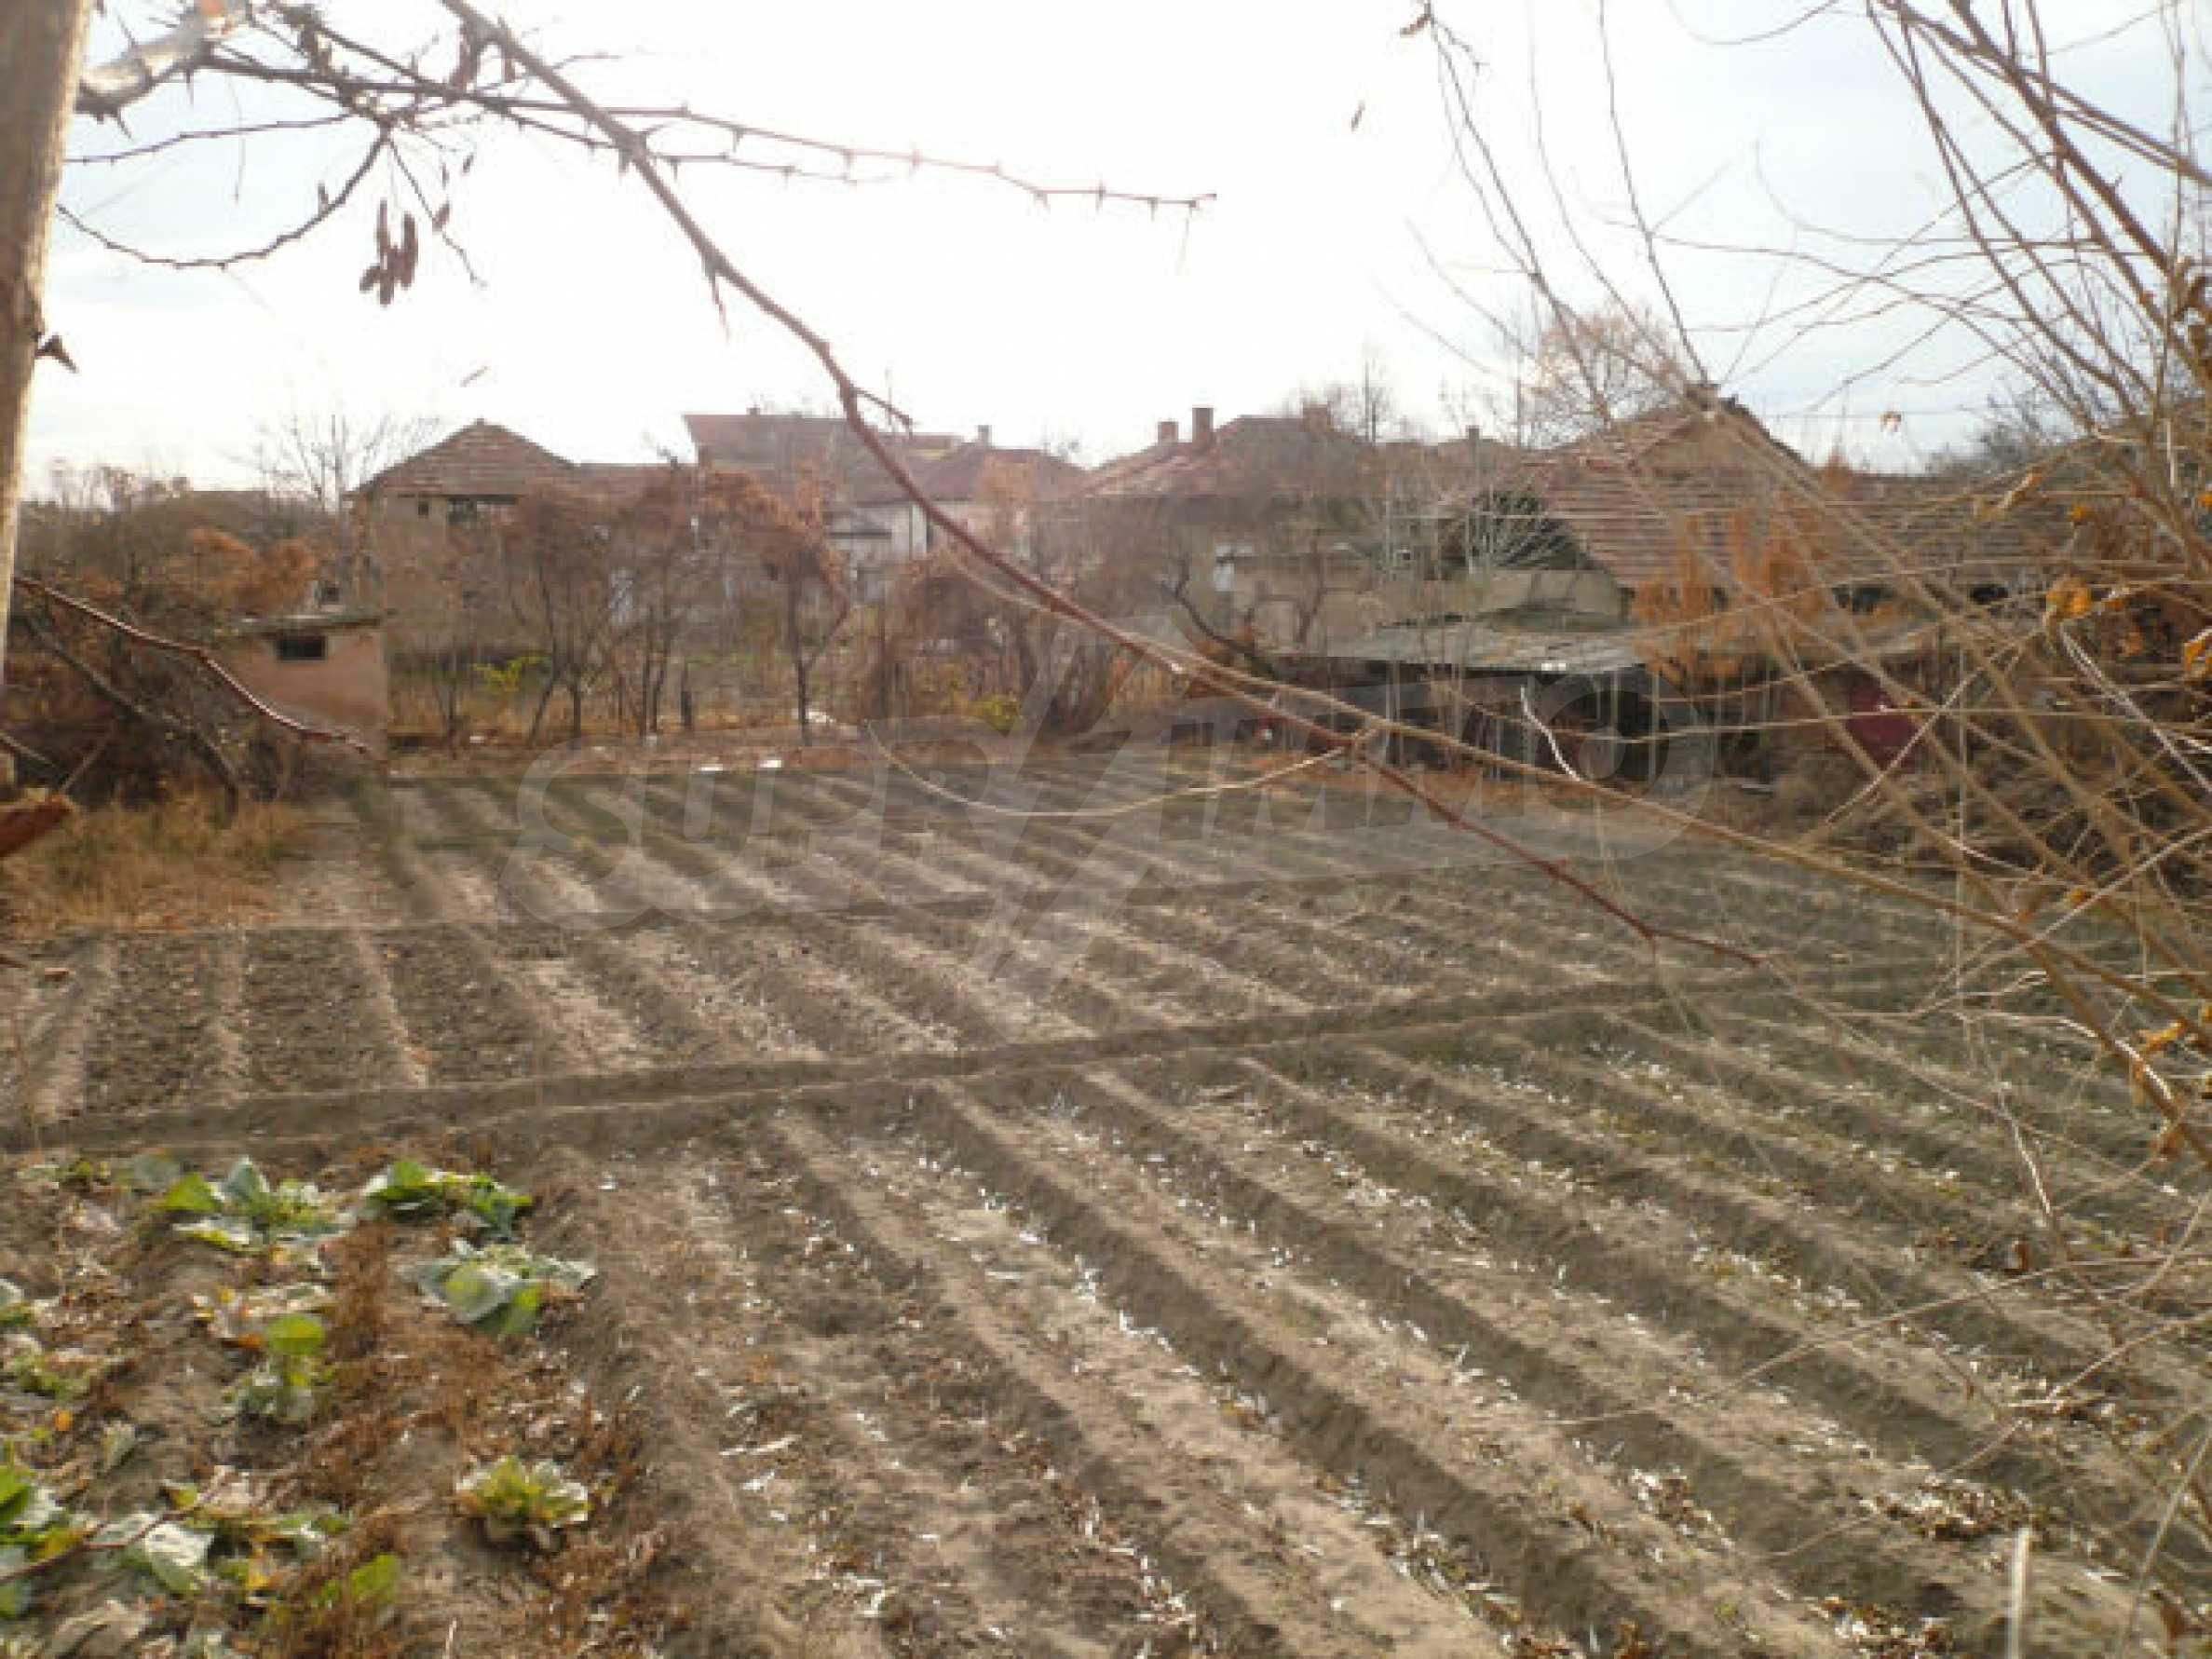 Участок под застройку дома в городе Видин 4